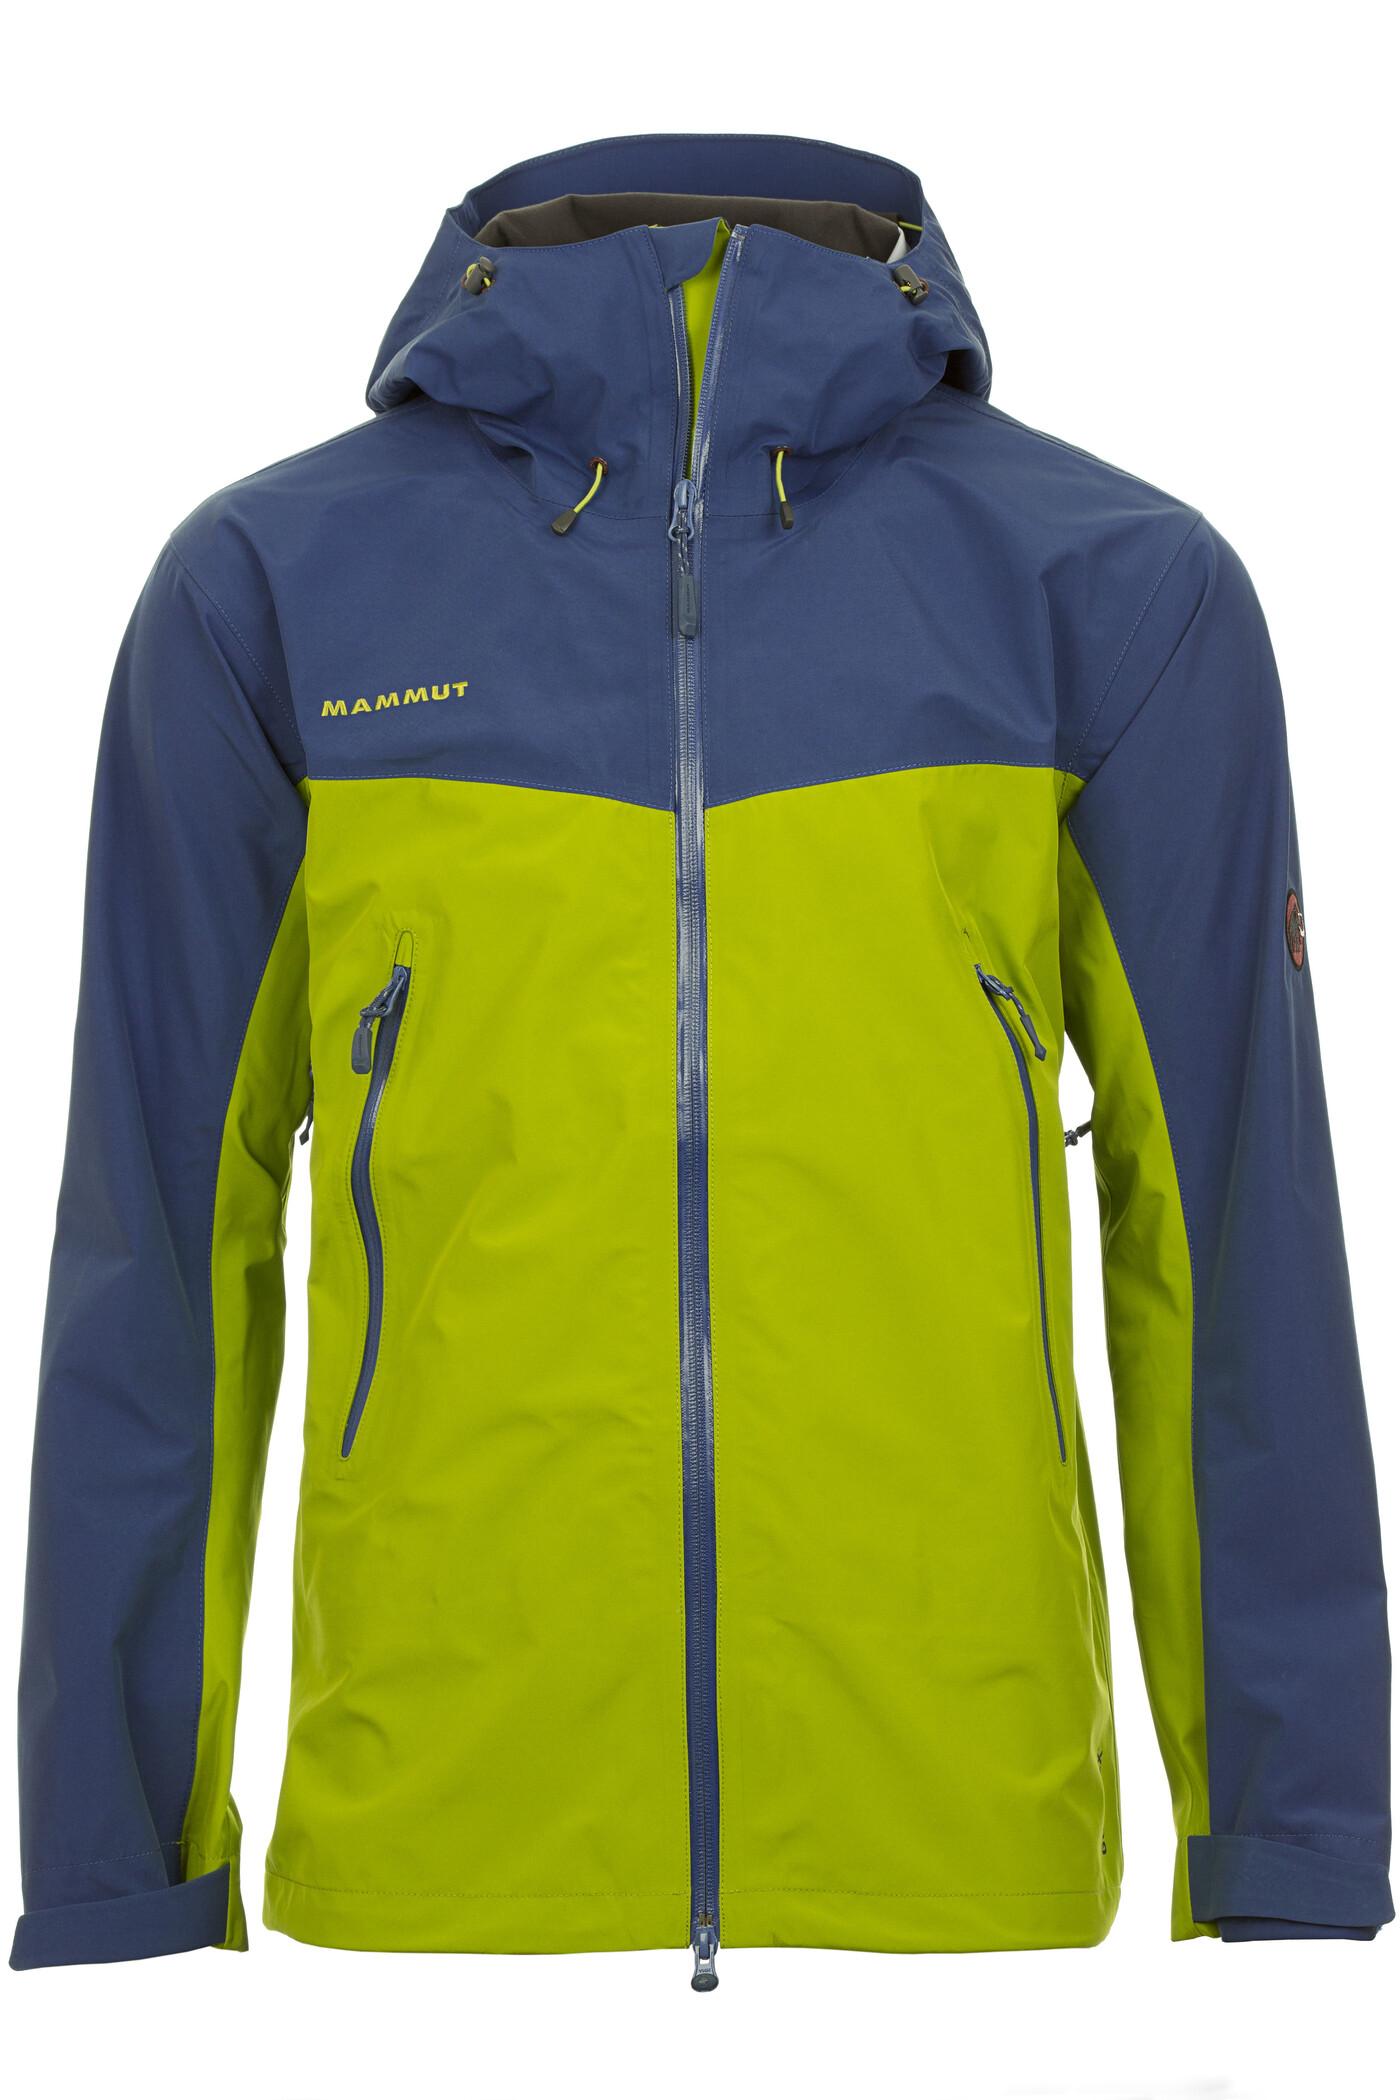 Mammut Crater Jacket Men peridot-ensign XL jacke~oberteil~Bekleidung~Outdoor~outdoorjacke~outdoorbekleidung~hardshelljacke~hardshell jacke